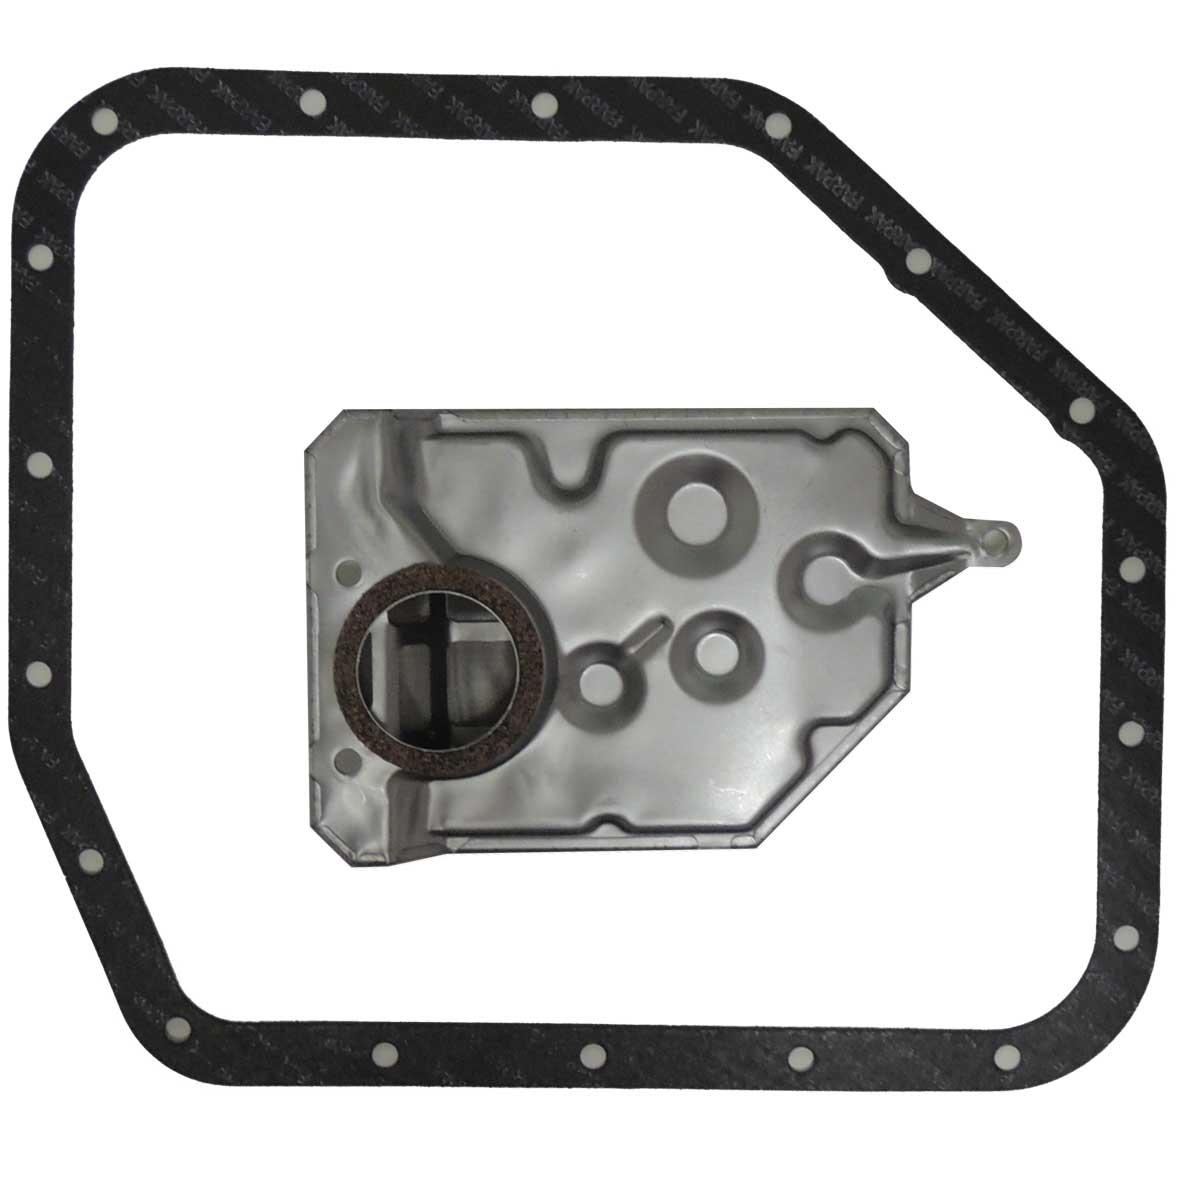 Kit Filtro E Junta - Câmbio Automático A240E - Corolla  - Alltrans - Transmissão Automática